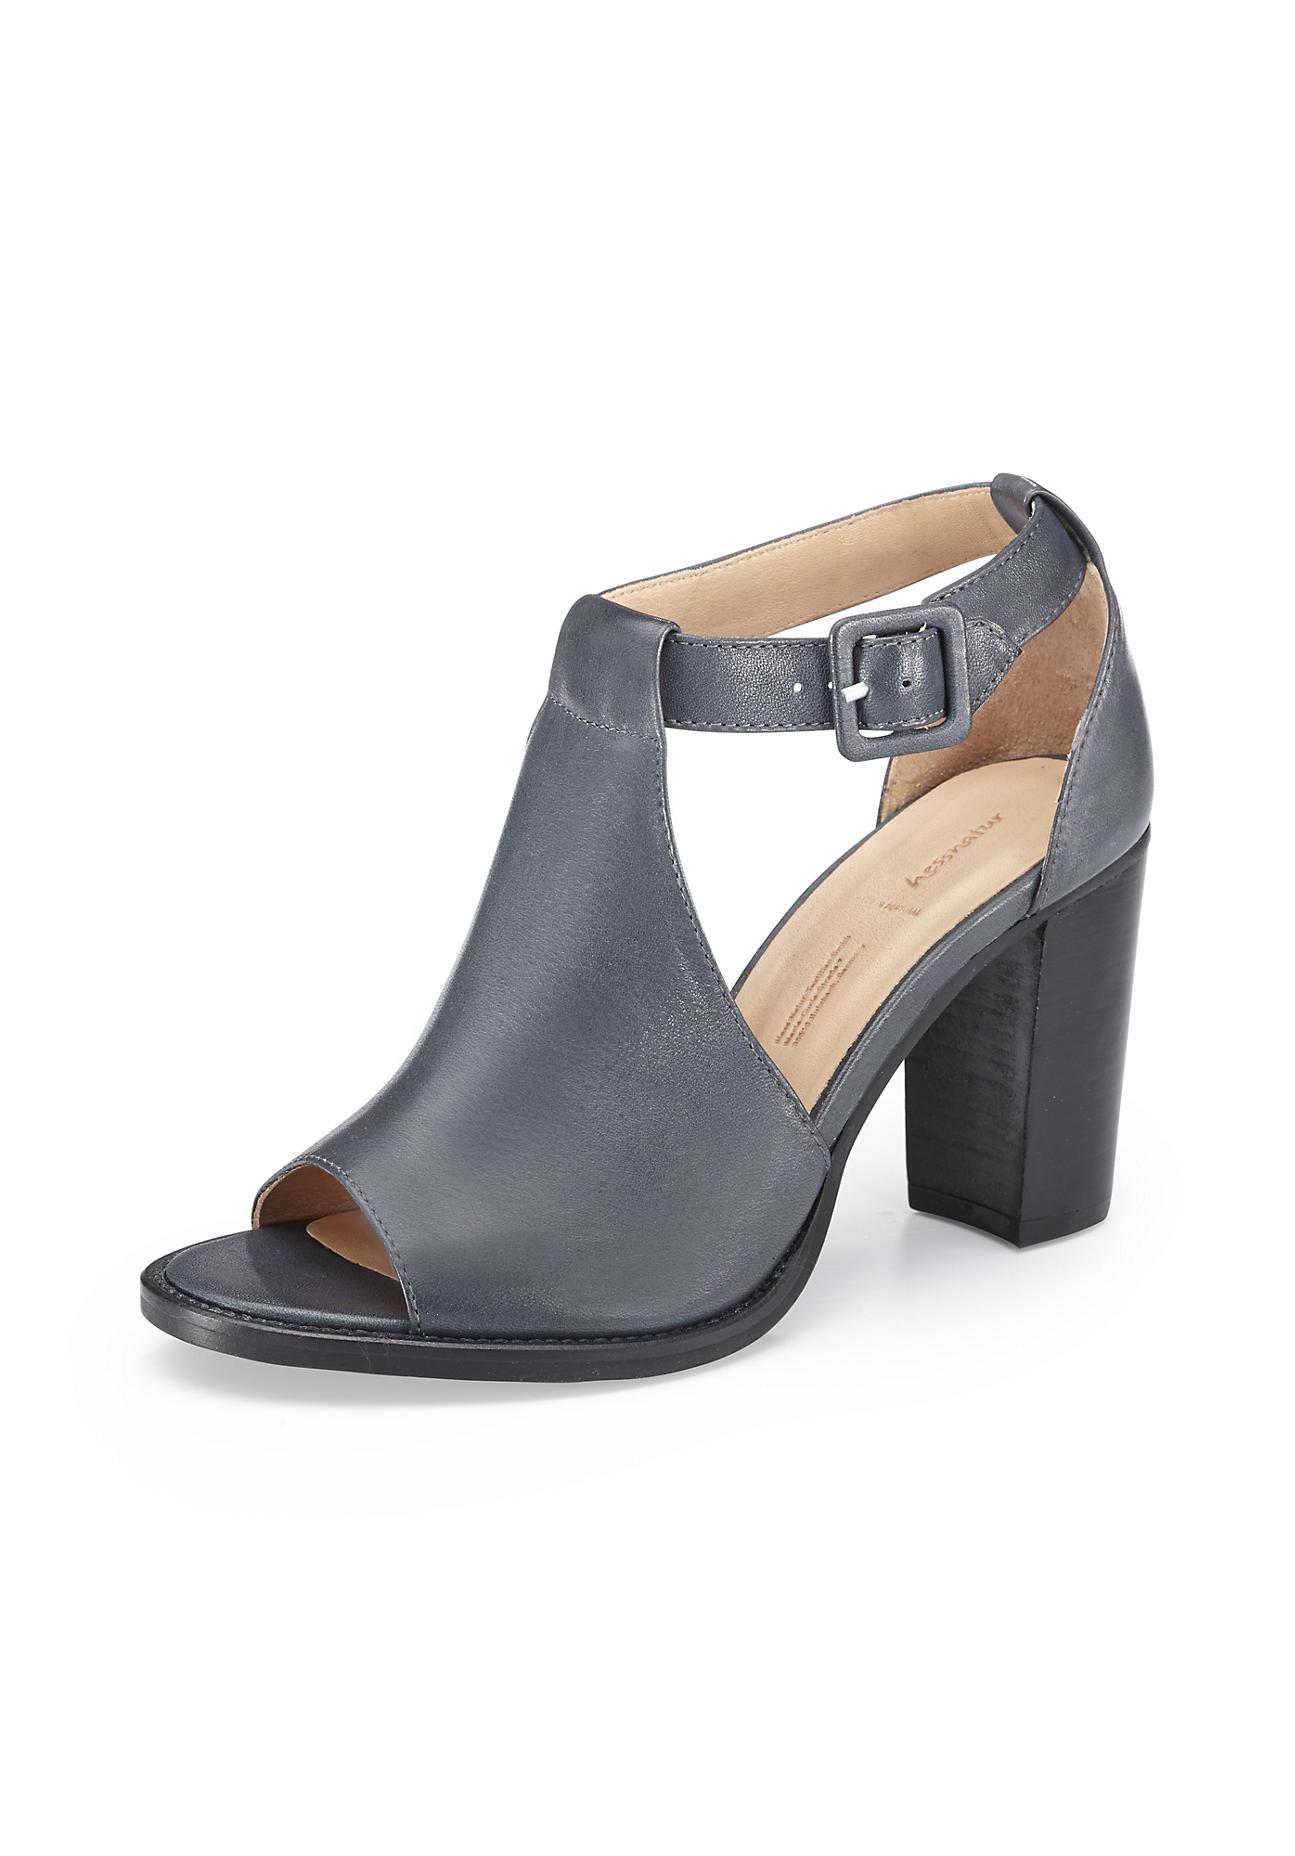 hessnatur Damen Damen Sandalette aus Leder – blau – Größe 39